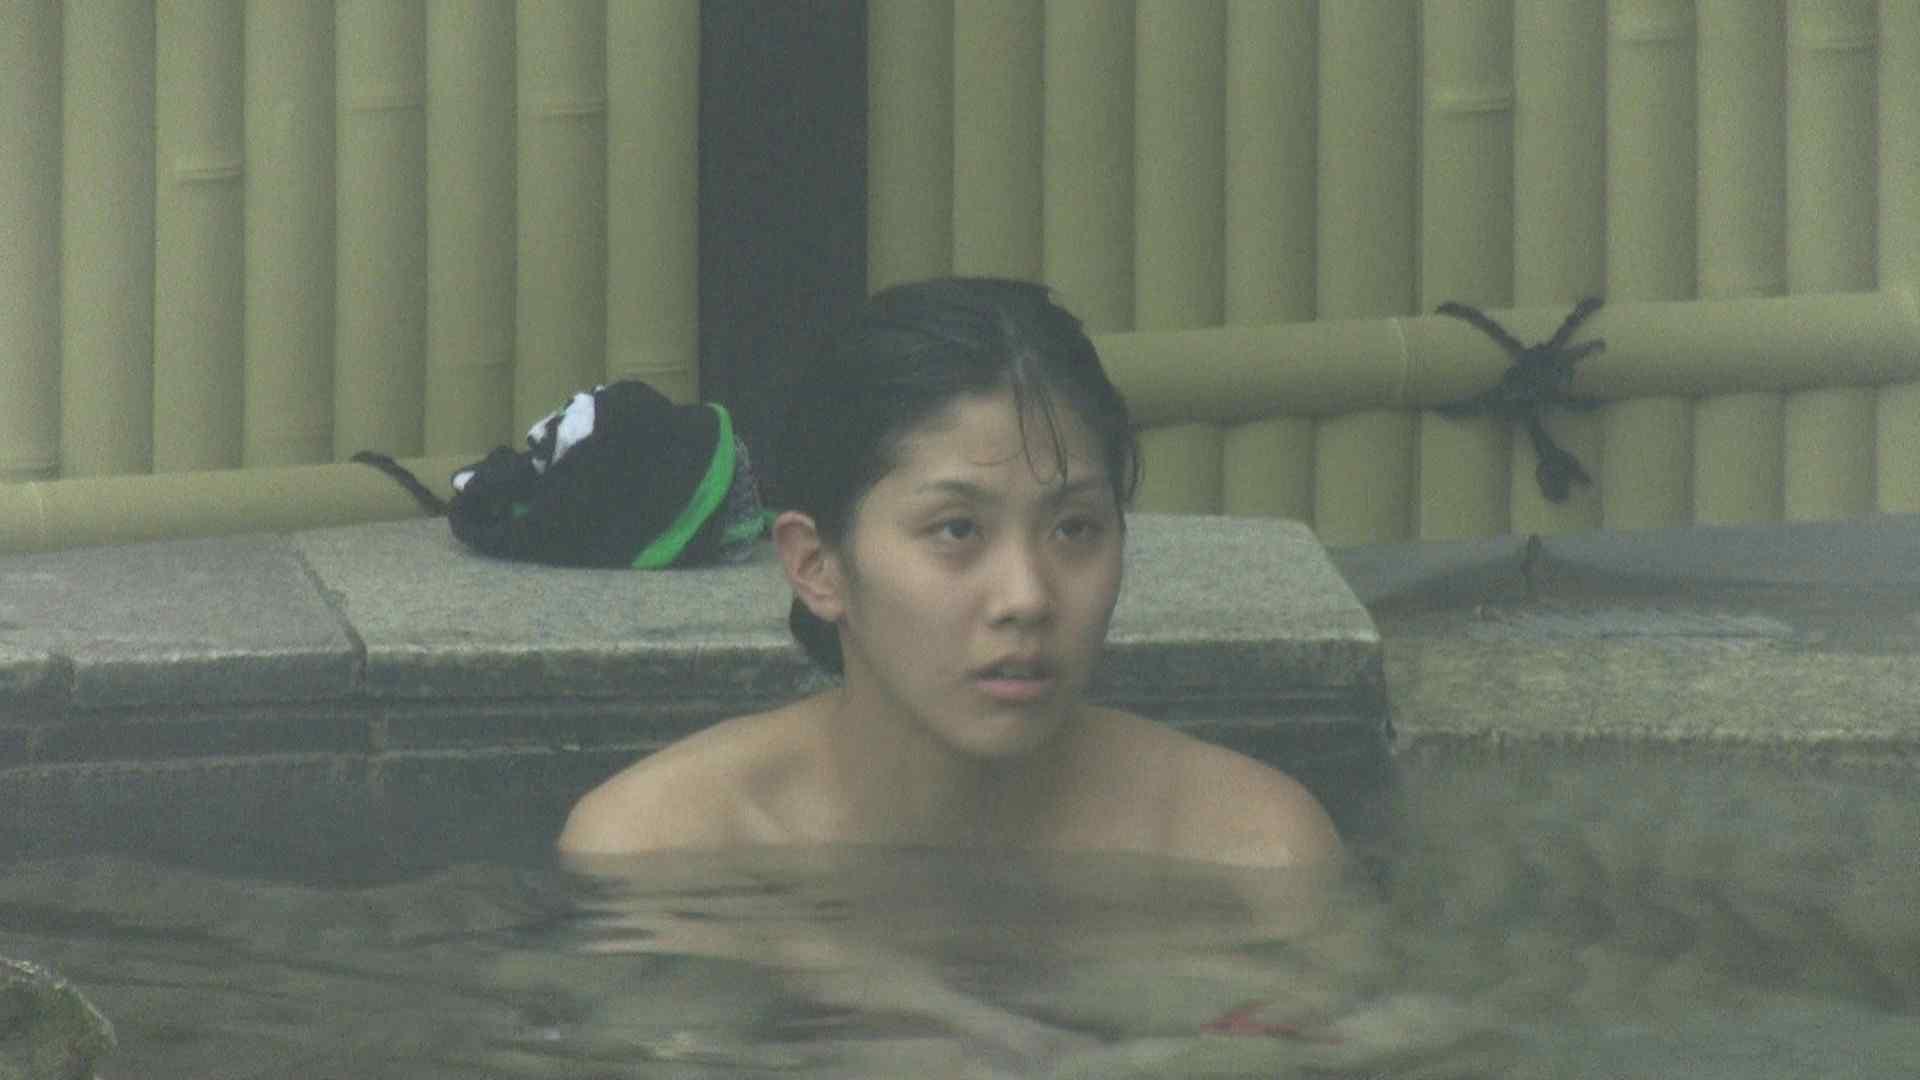 Aquaな露天風呂Vol.174 盗撮大放出 オマンコ無修正動画無料 97連発 26